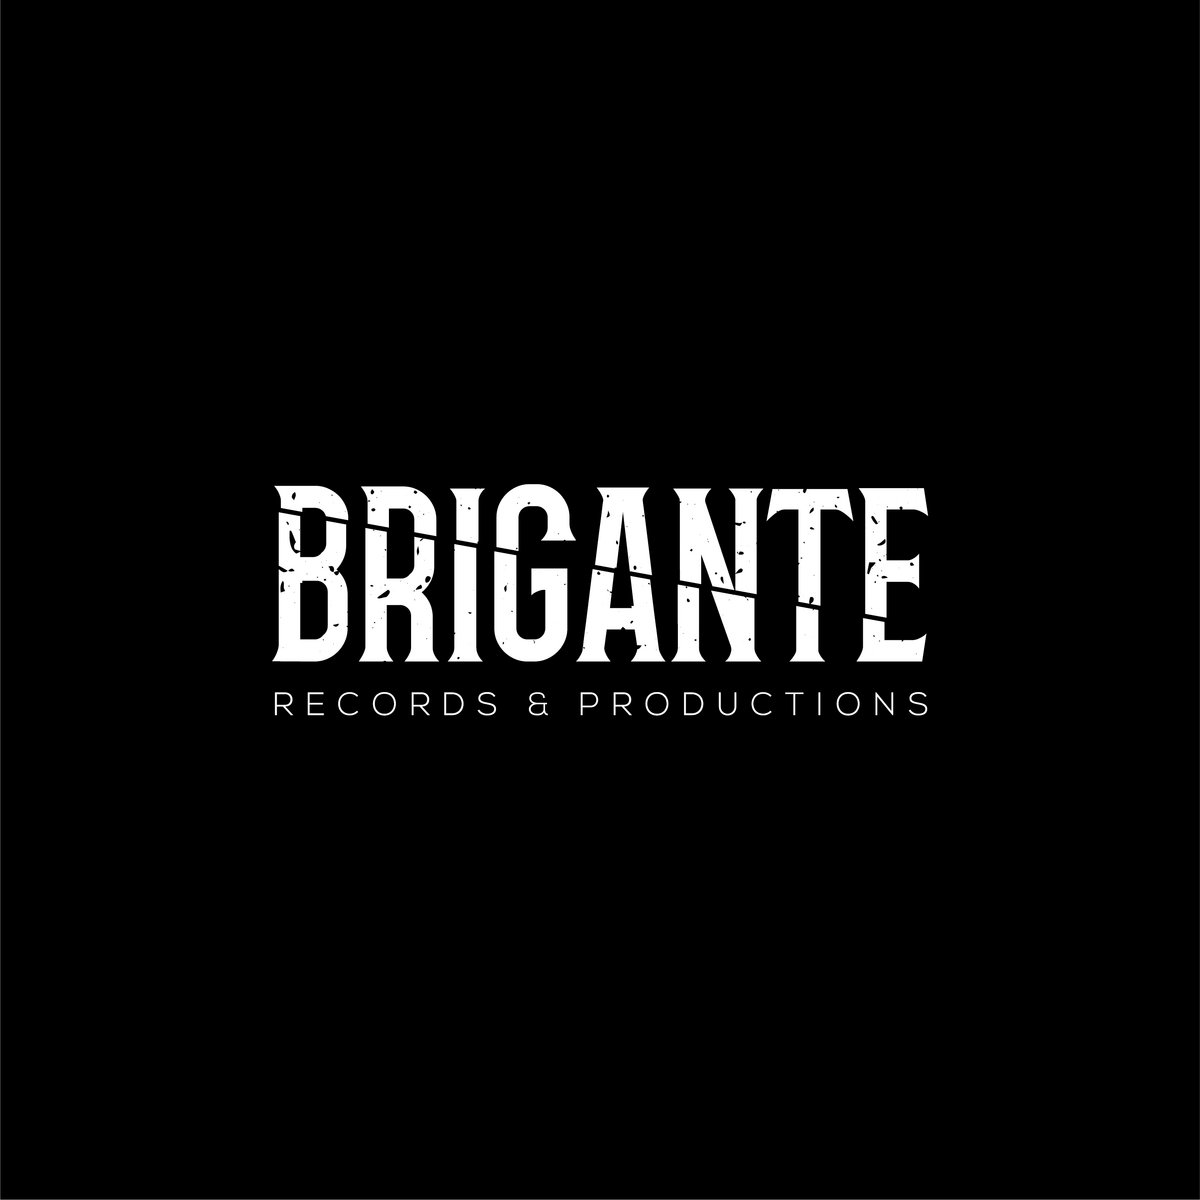 Ohrwurm Brigante Records Amp Productions